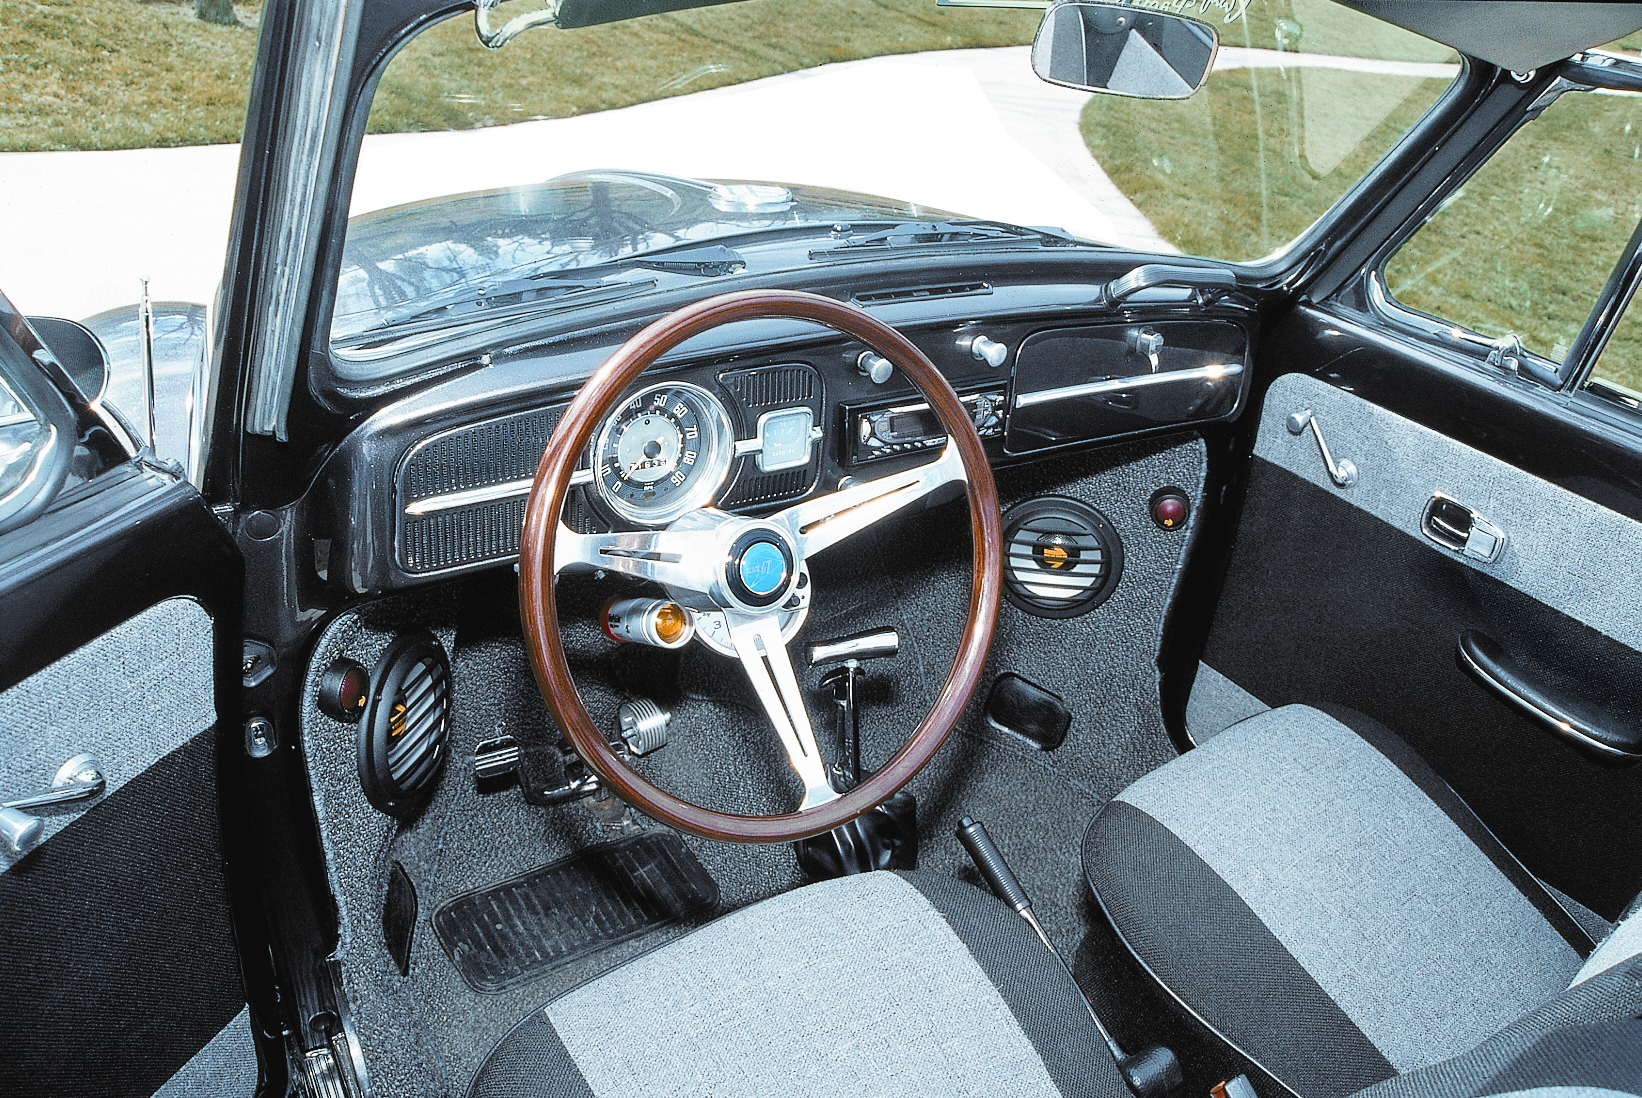 High Quality 1963 VW Bug Convertible Interior Kits